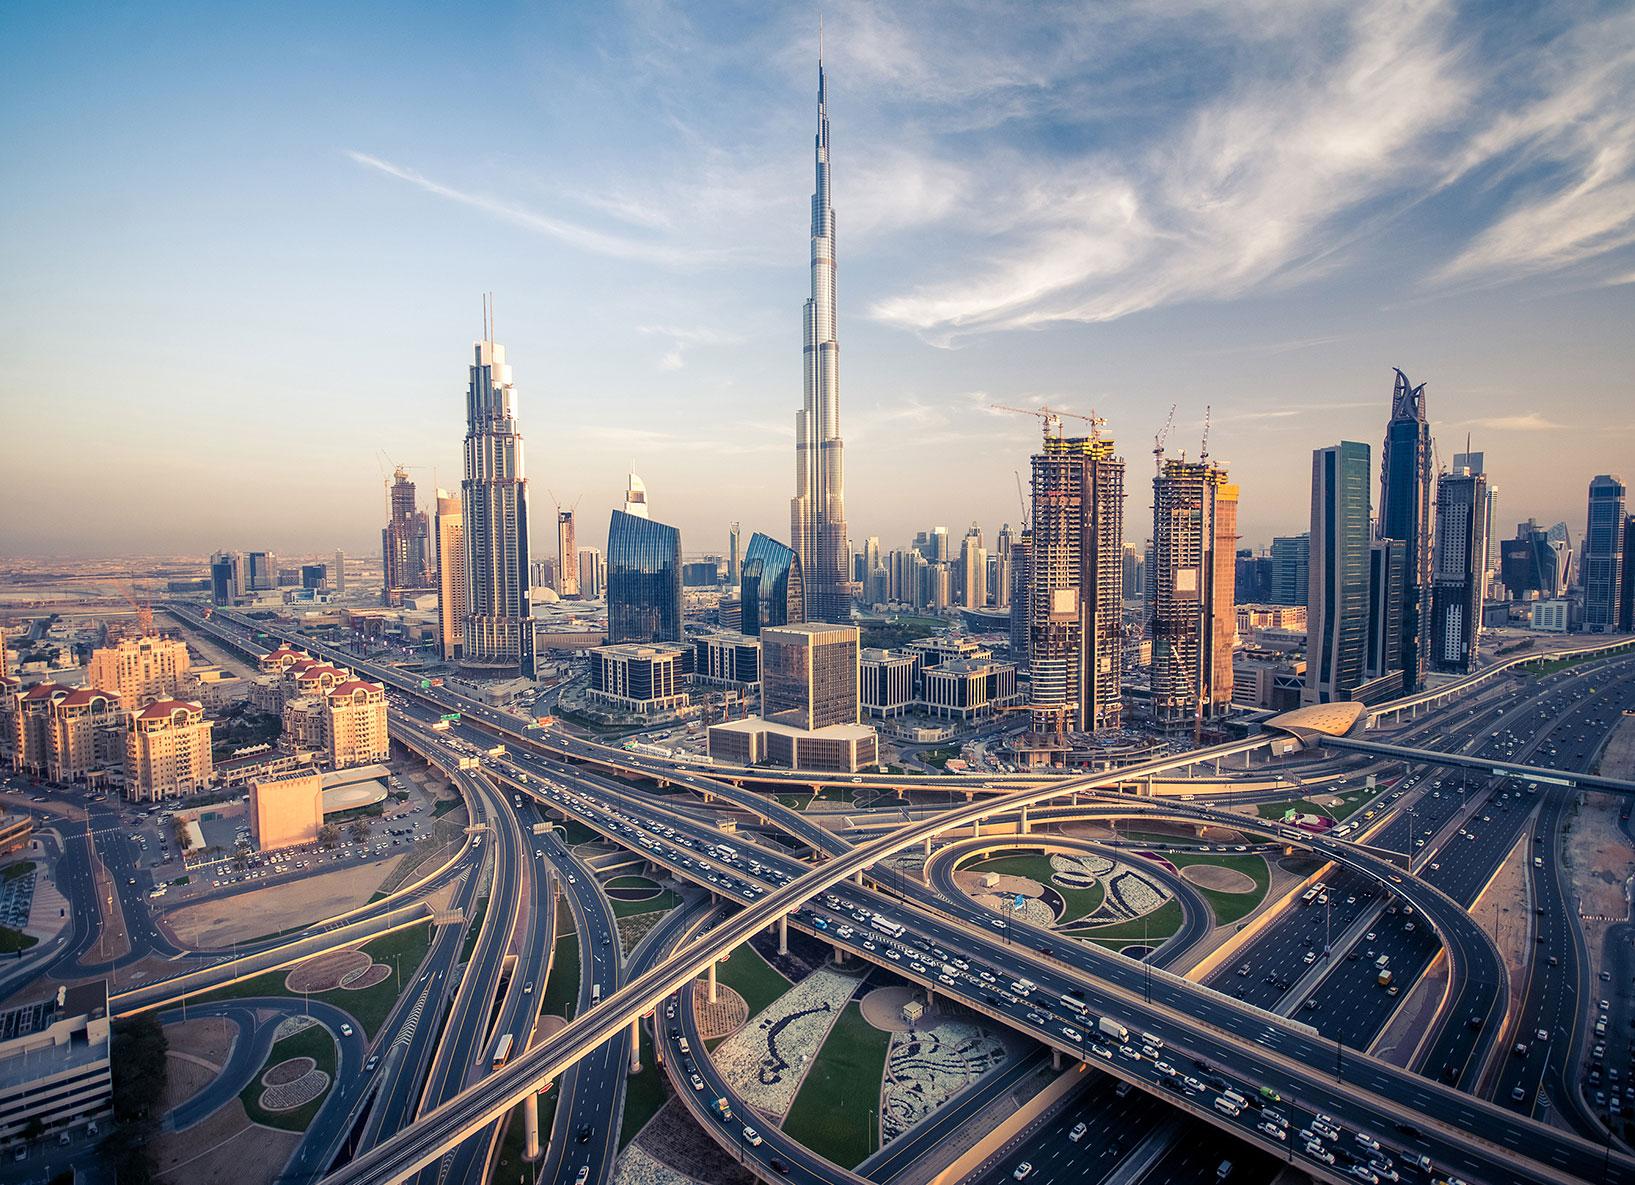 How To Apply for Dubai Visa In Nigeria